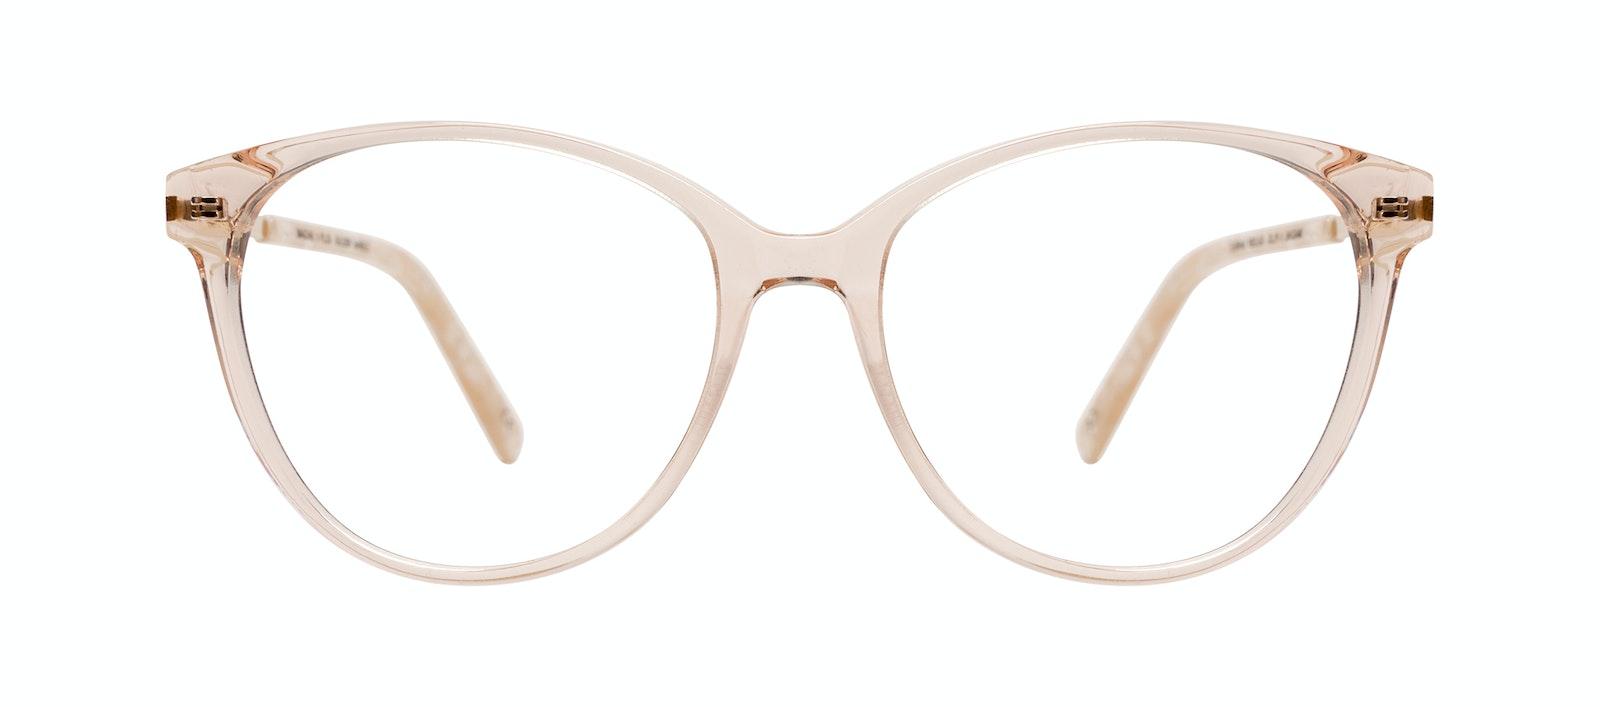 Affordable Fashion Glasses Round Eyeglasses Women Imagine II Plus Golden Marble Front